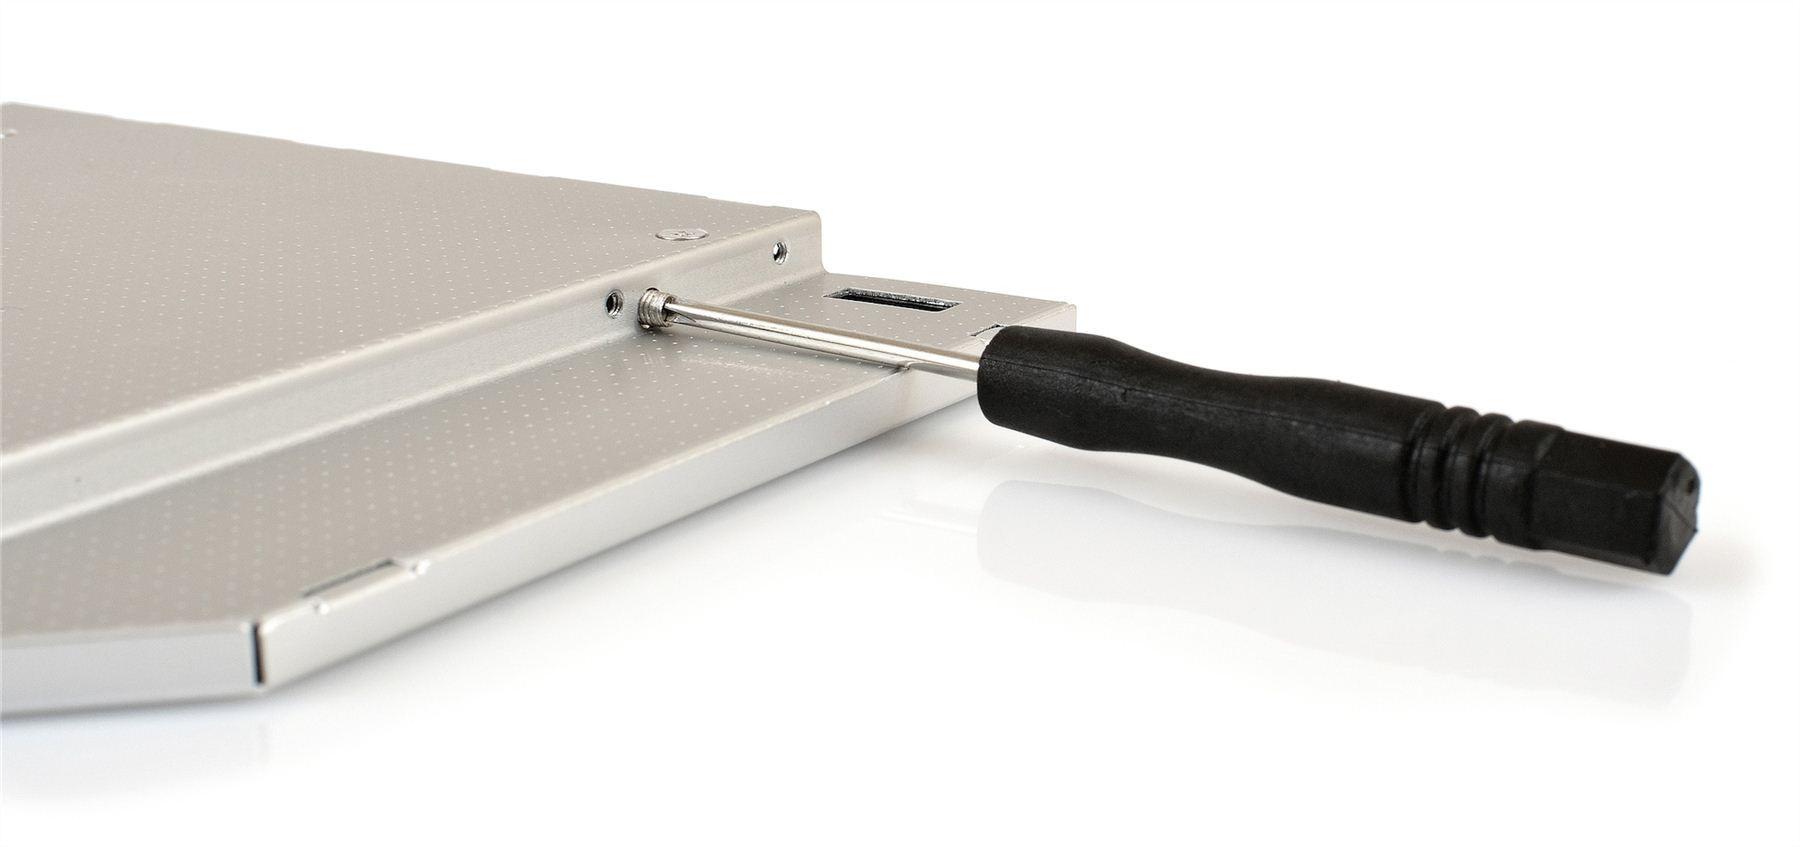 Opticaddy SATA-3 second HDD//SSD Caddy for Lenovo Ideapad 300-15IBR 300-15ISK